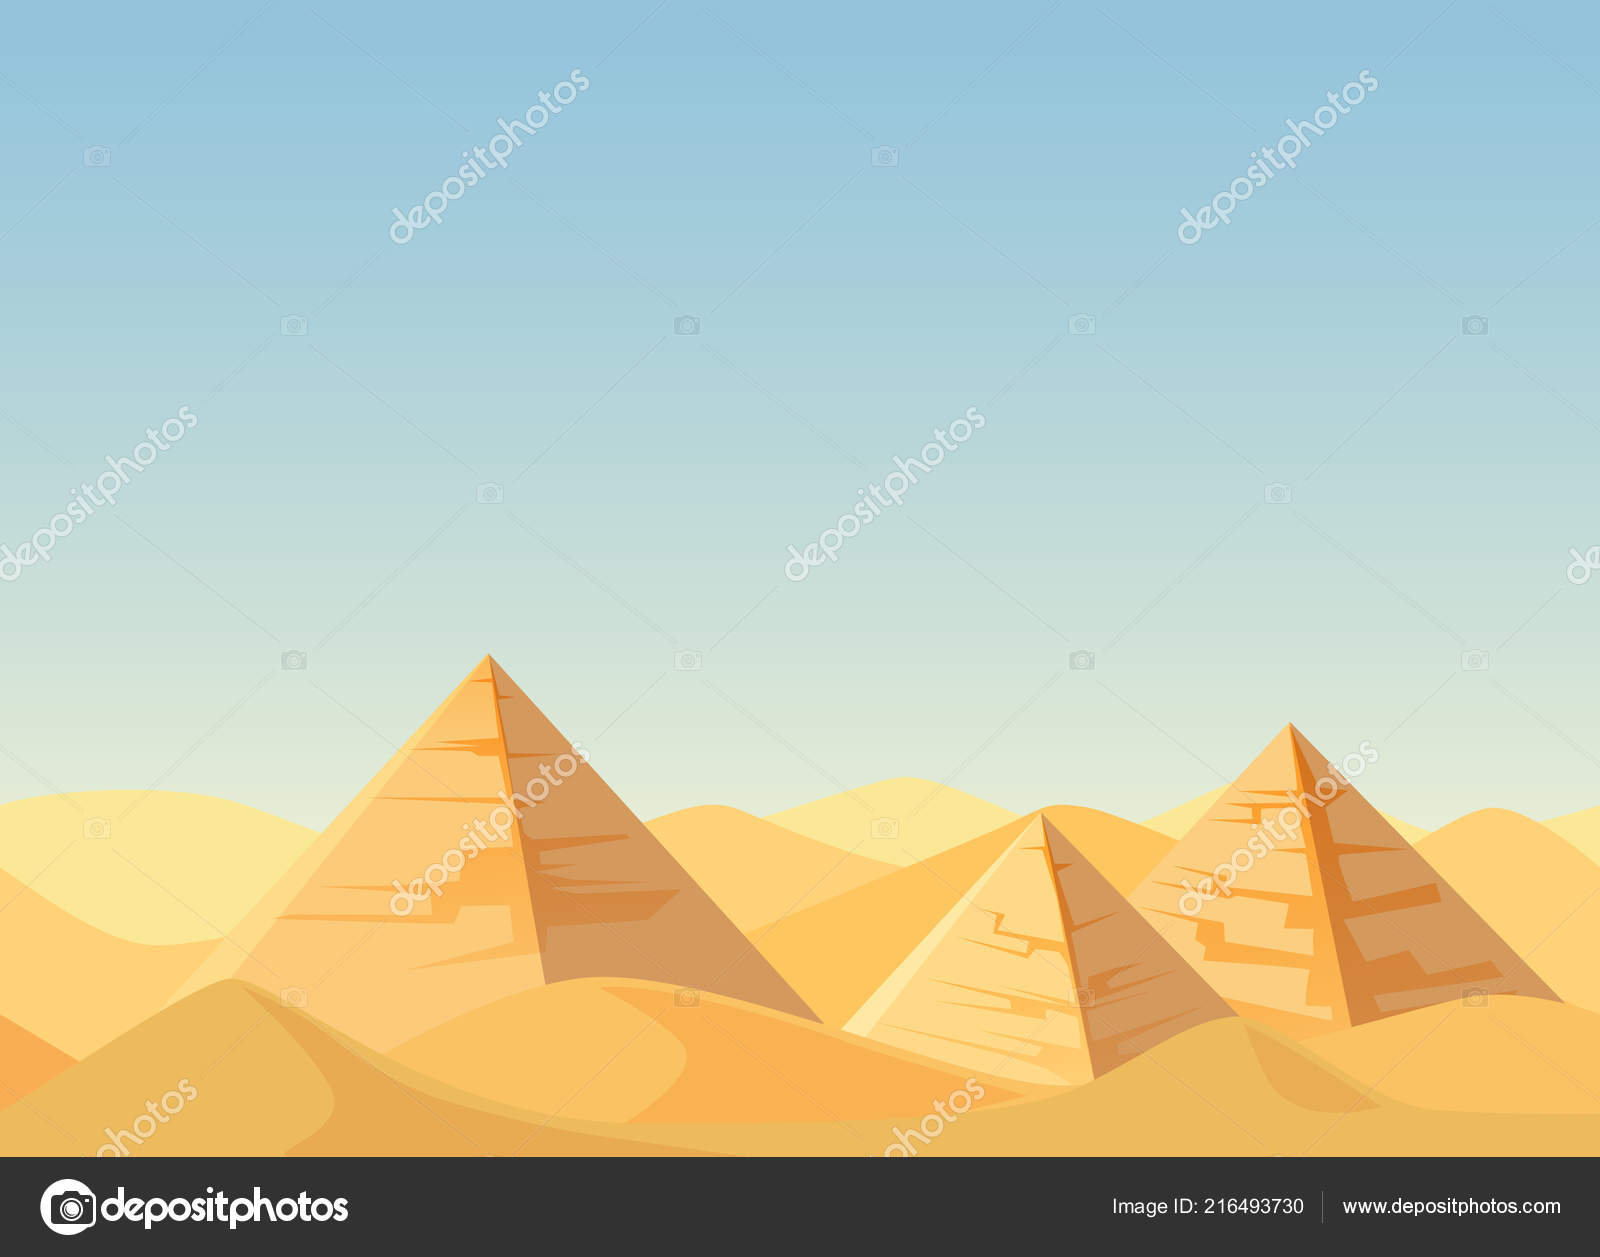 Egypt Pyramids Desert Landscape Cartoon Flat Vector Illustration